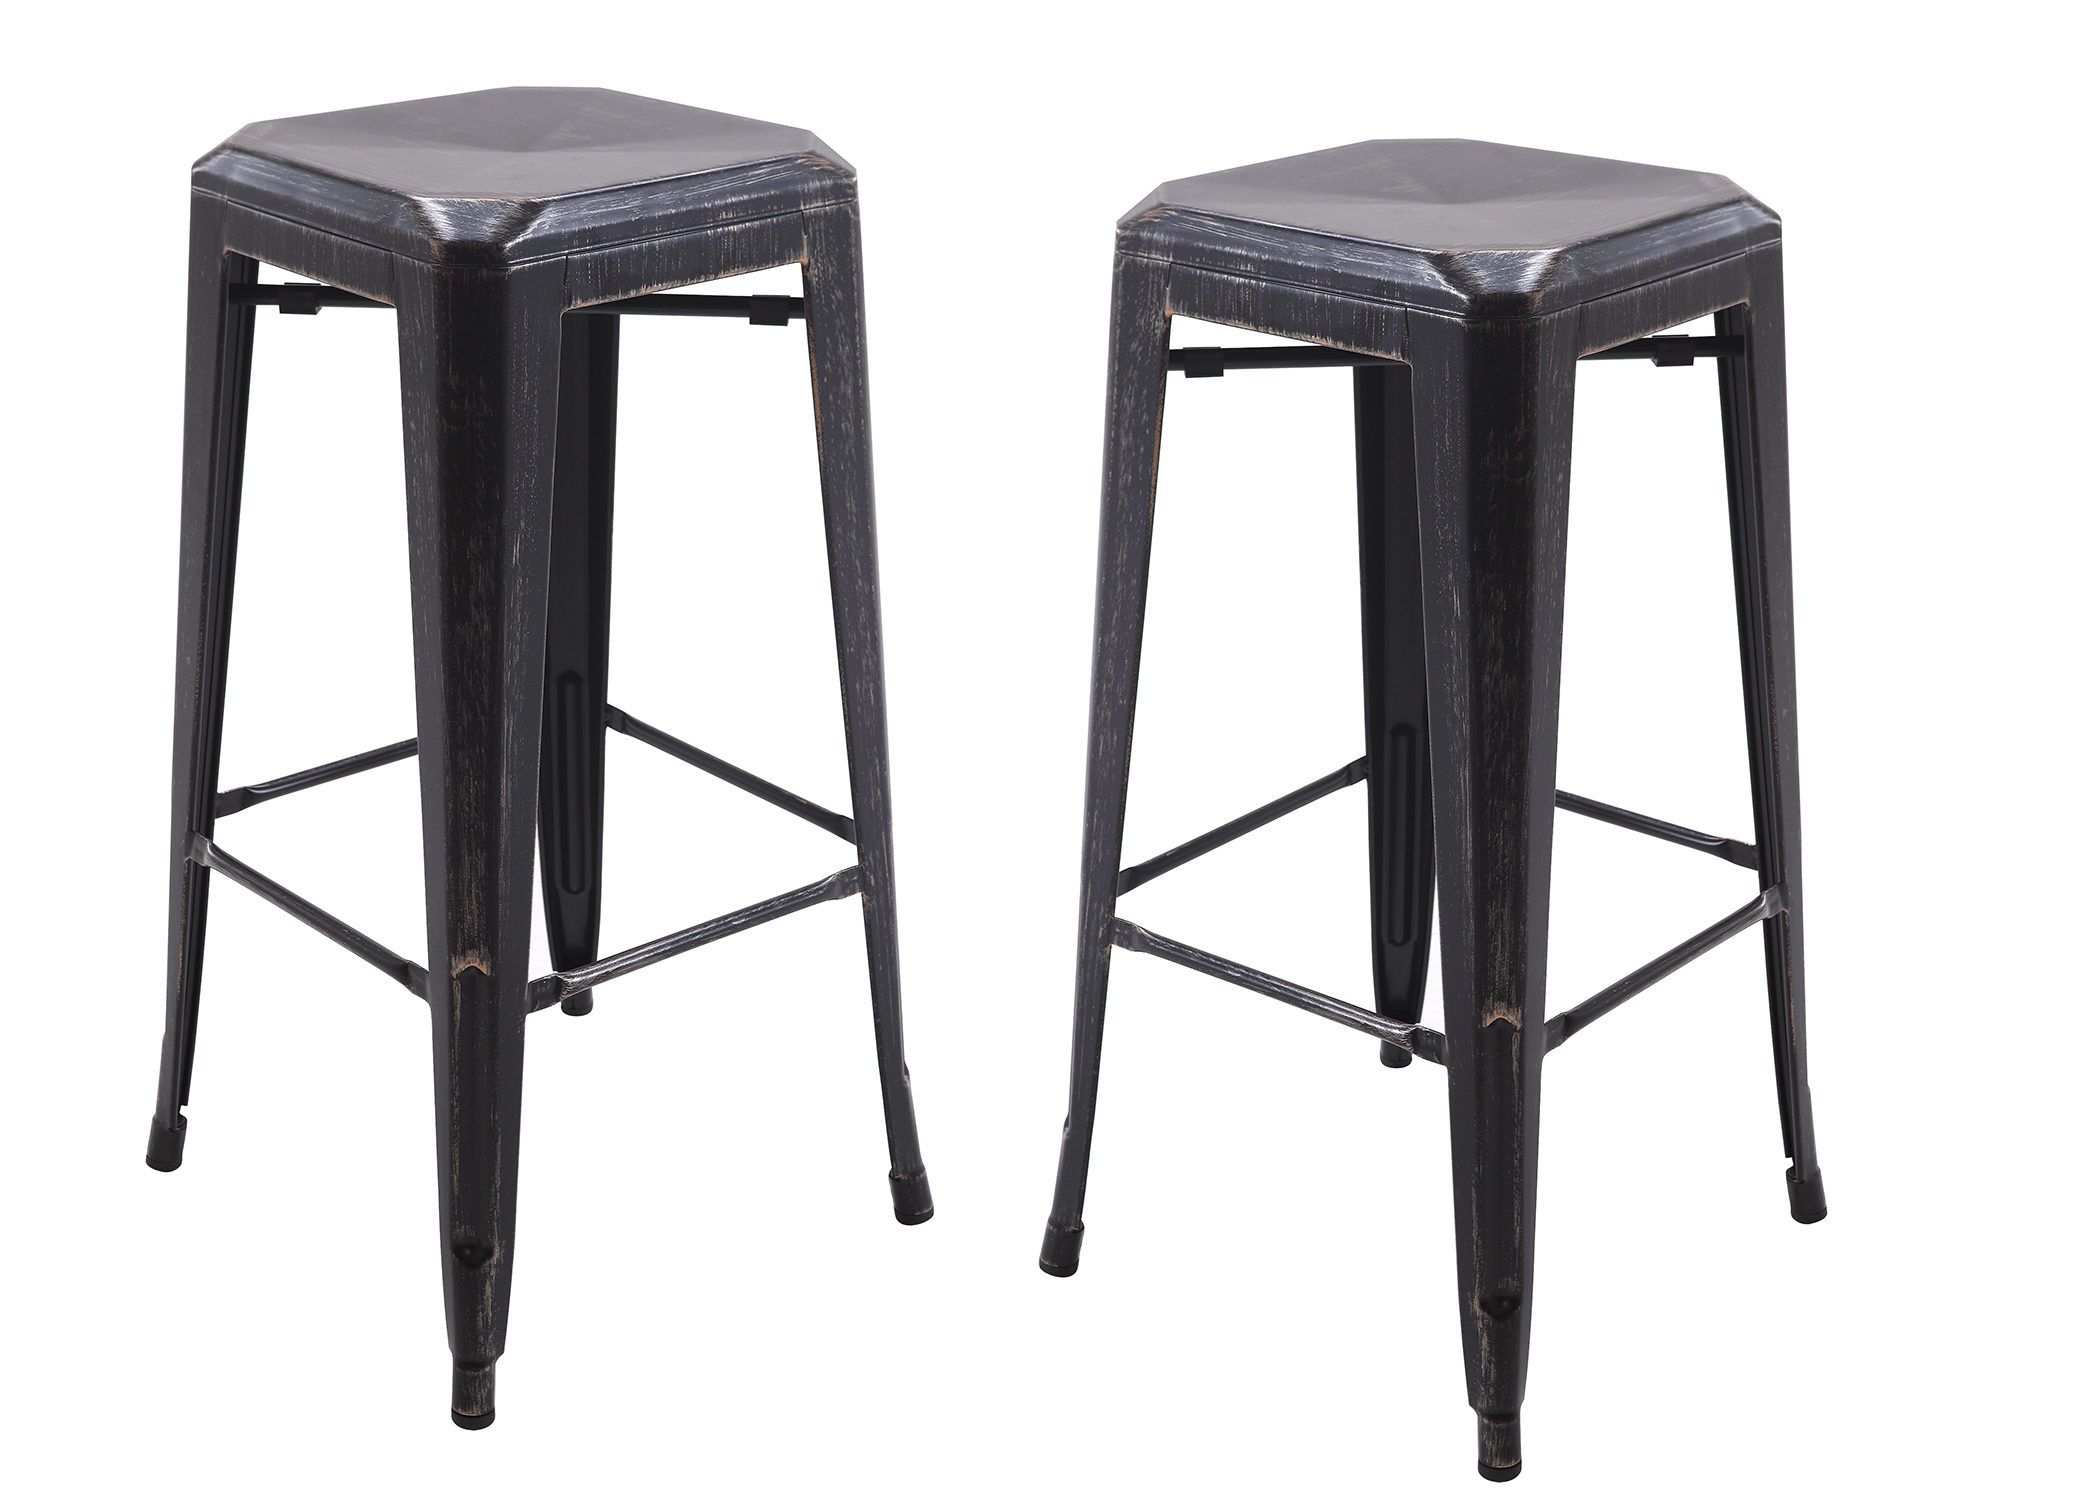 Vogue furniture direct metals 30 backless metal stool in antique matt blackcopper fully assembled vf1671006 walmart com